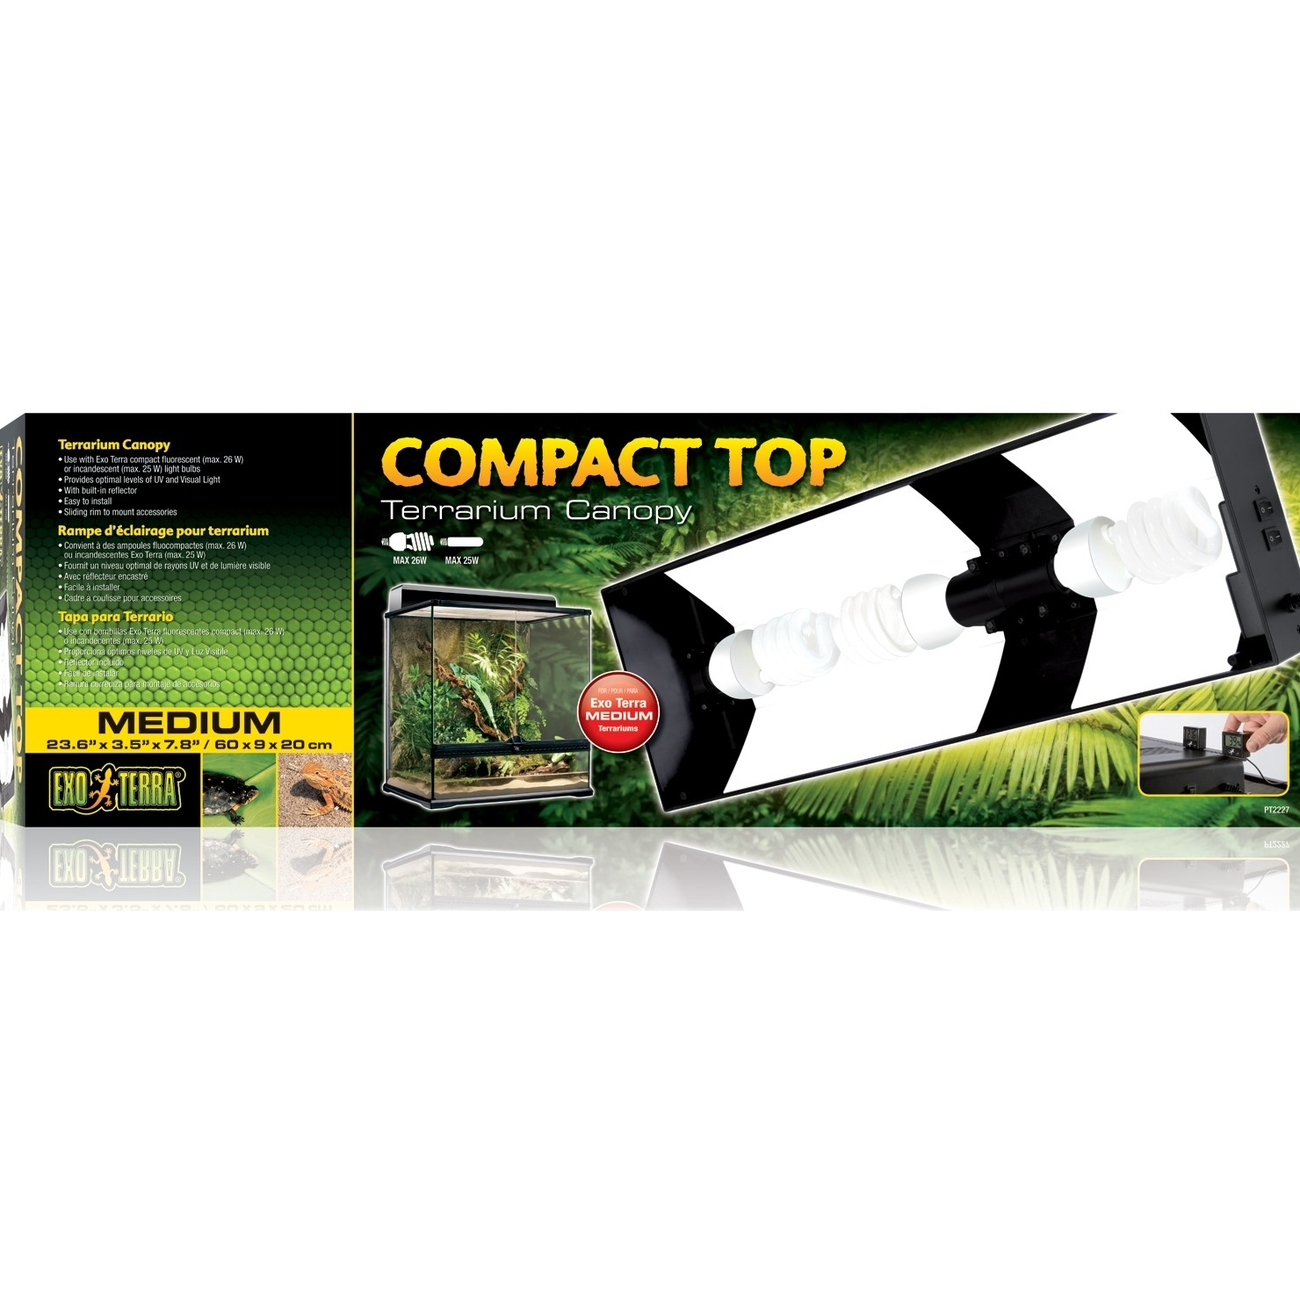 Exo Terra Compact Top - Abdeckung für Terrarienlampen, Bild 4